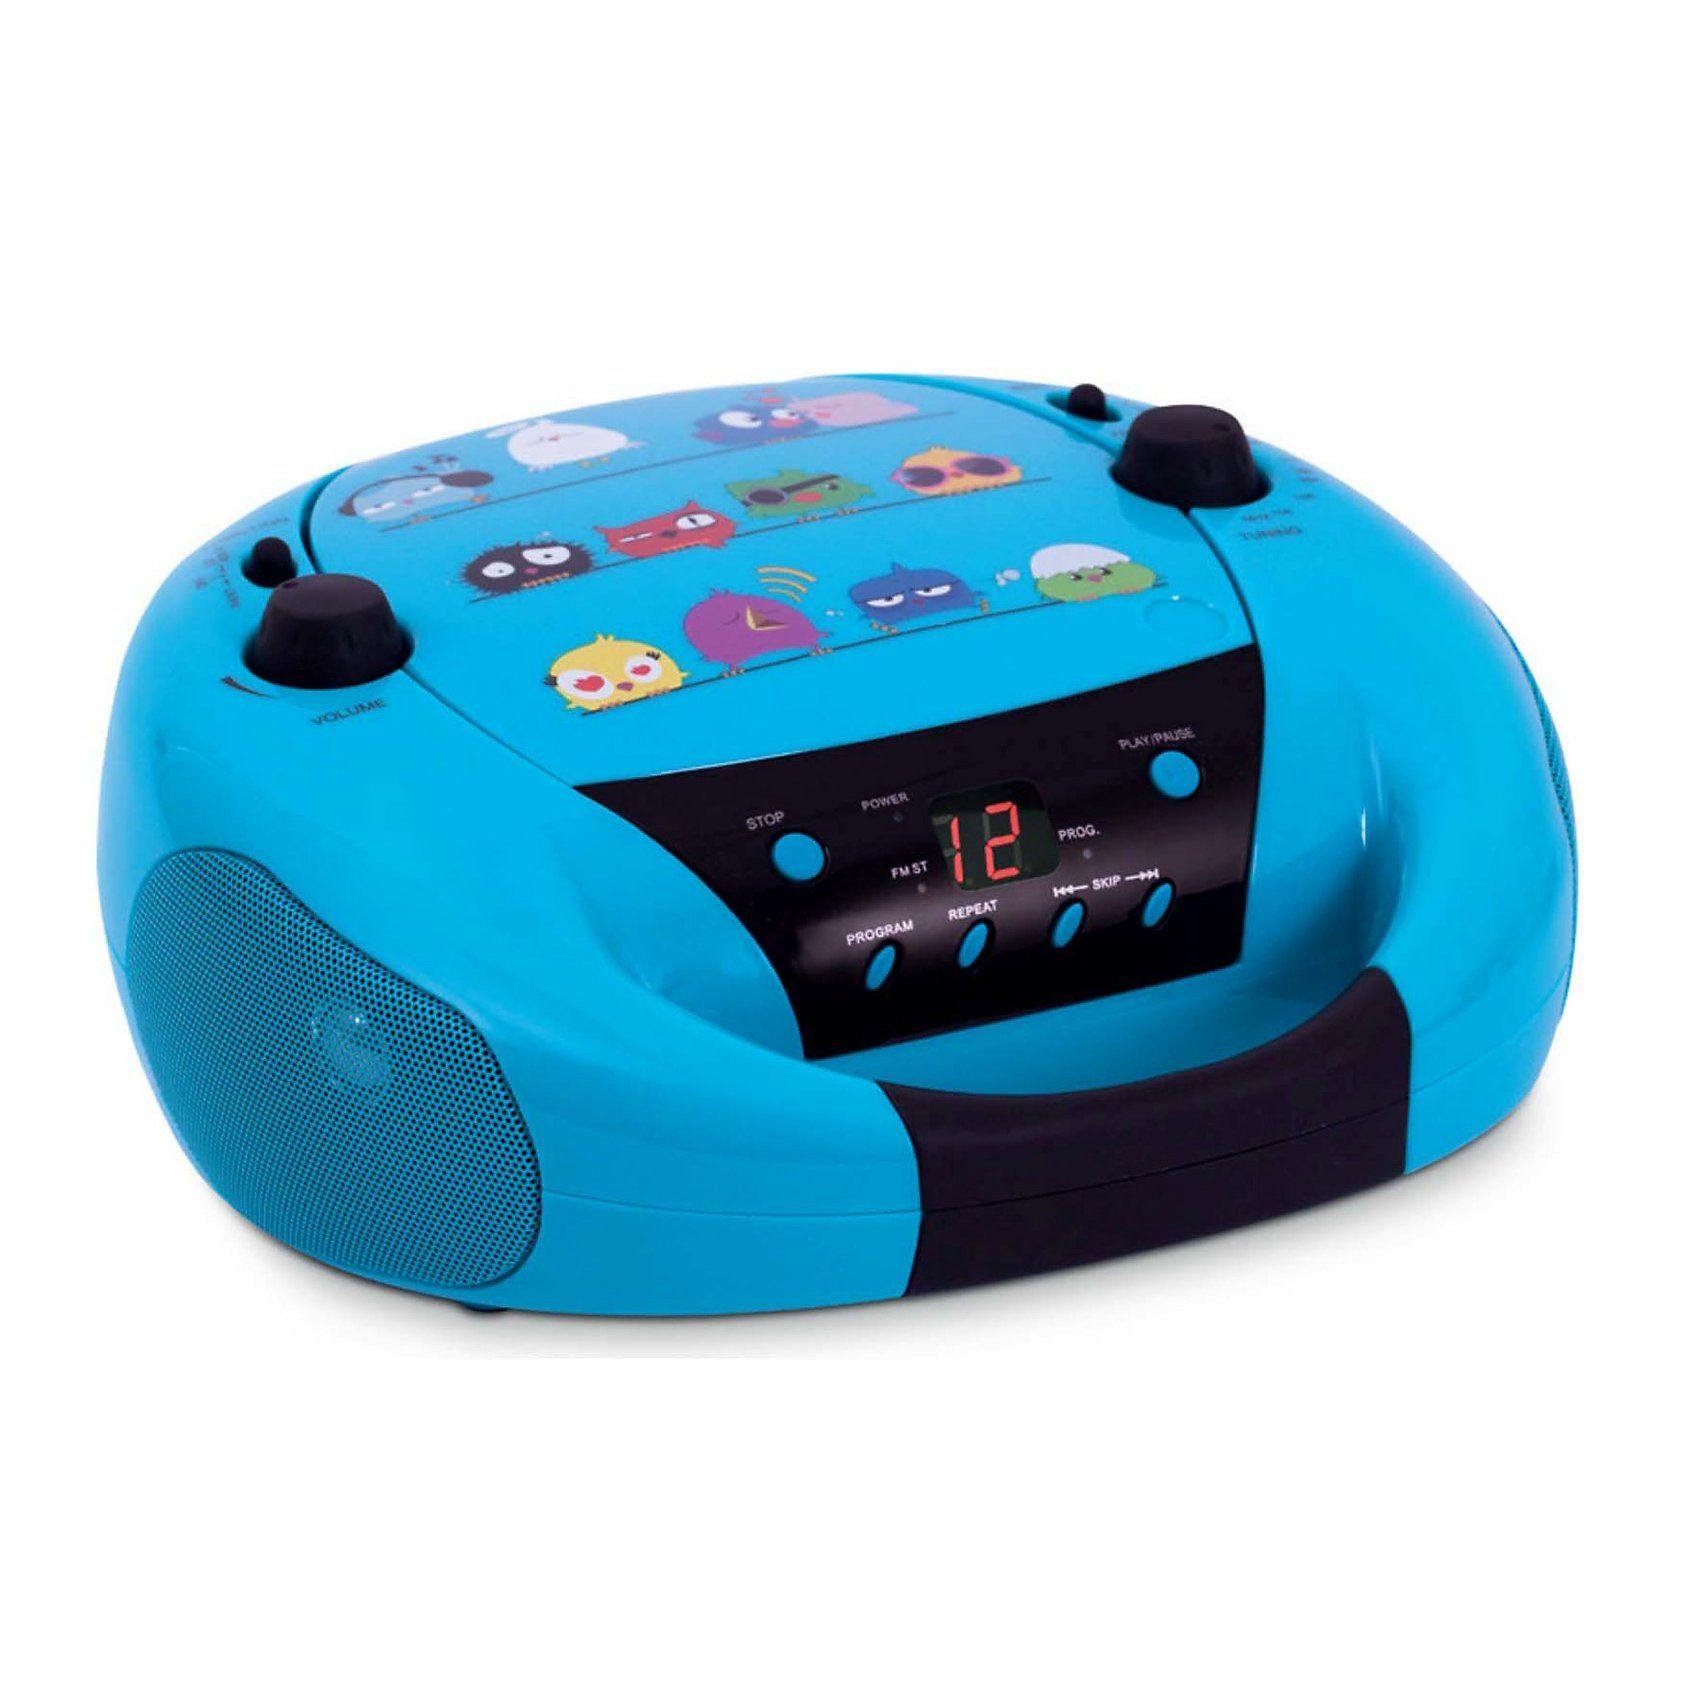 BigBen CD-Player mit Radio CD52, Birds